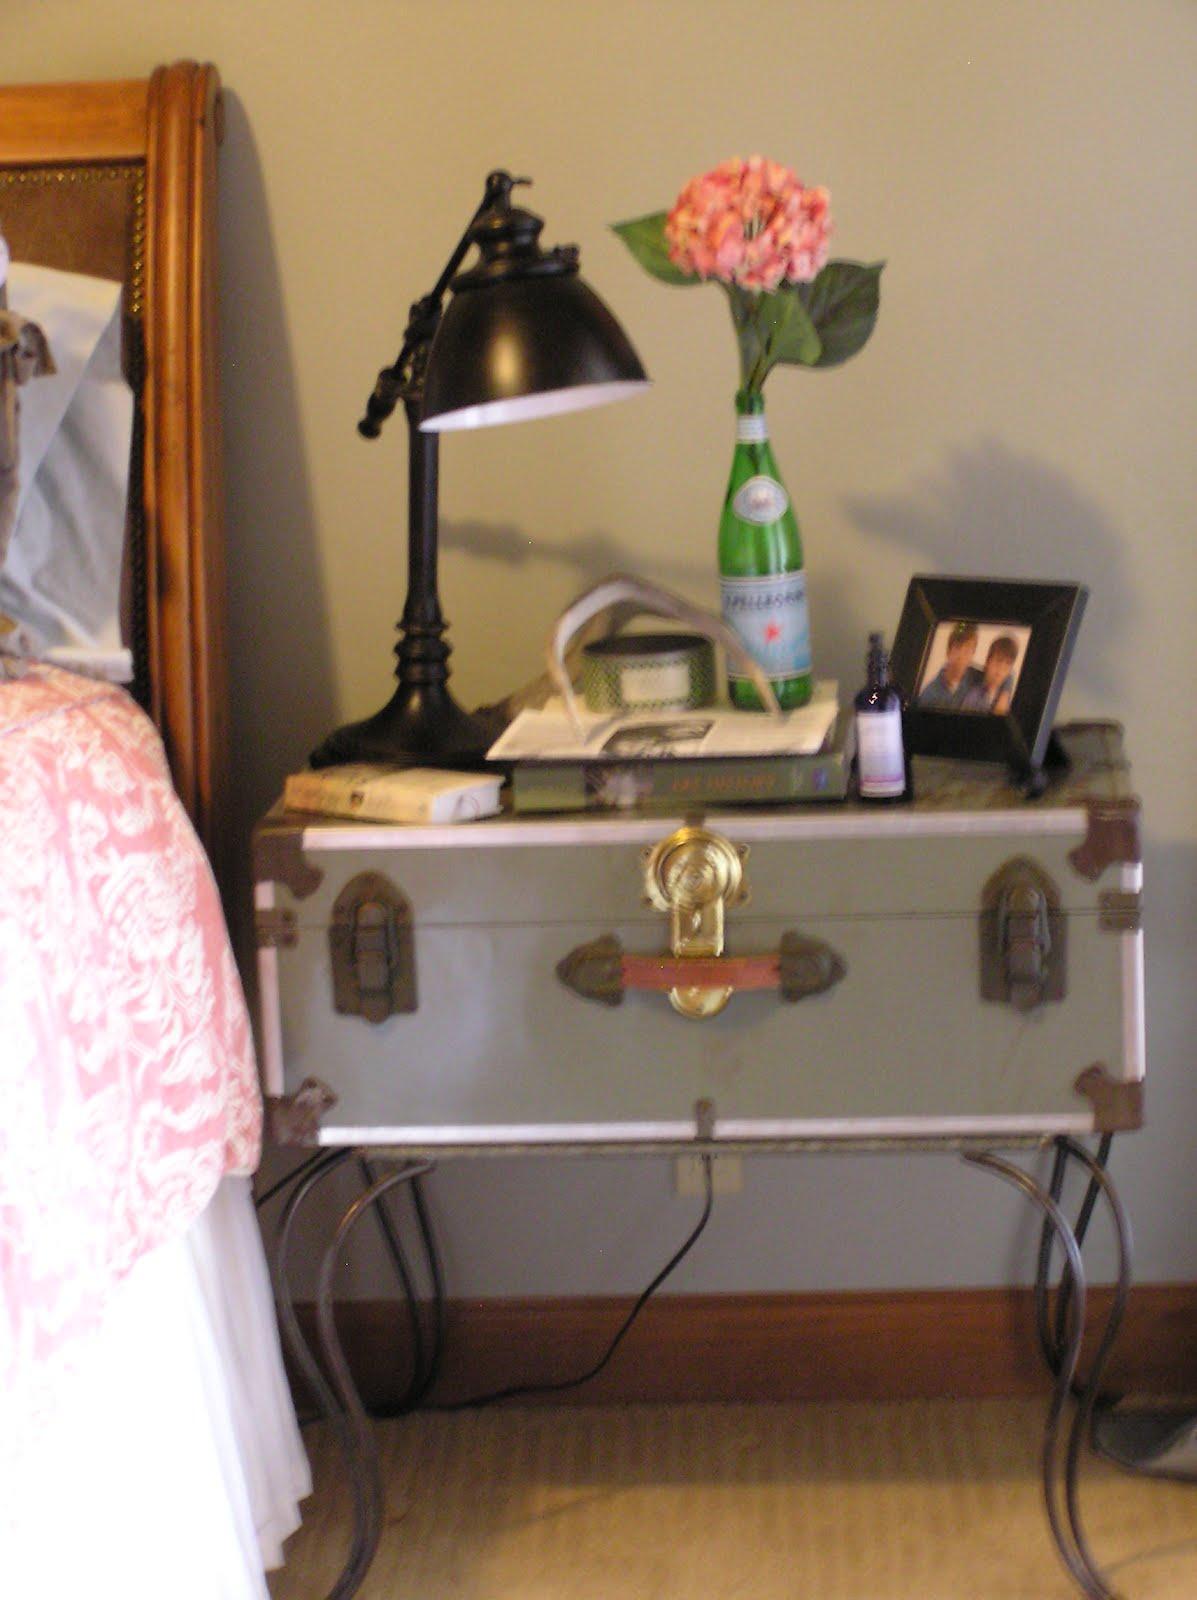 Old Trunk Bedside Table - The Vintage Cupboard: Old Trunk Bedside Table